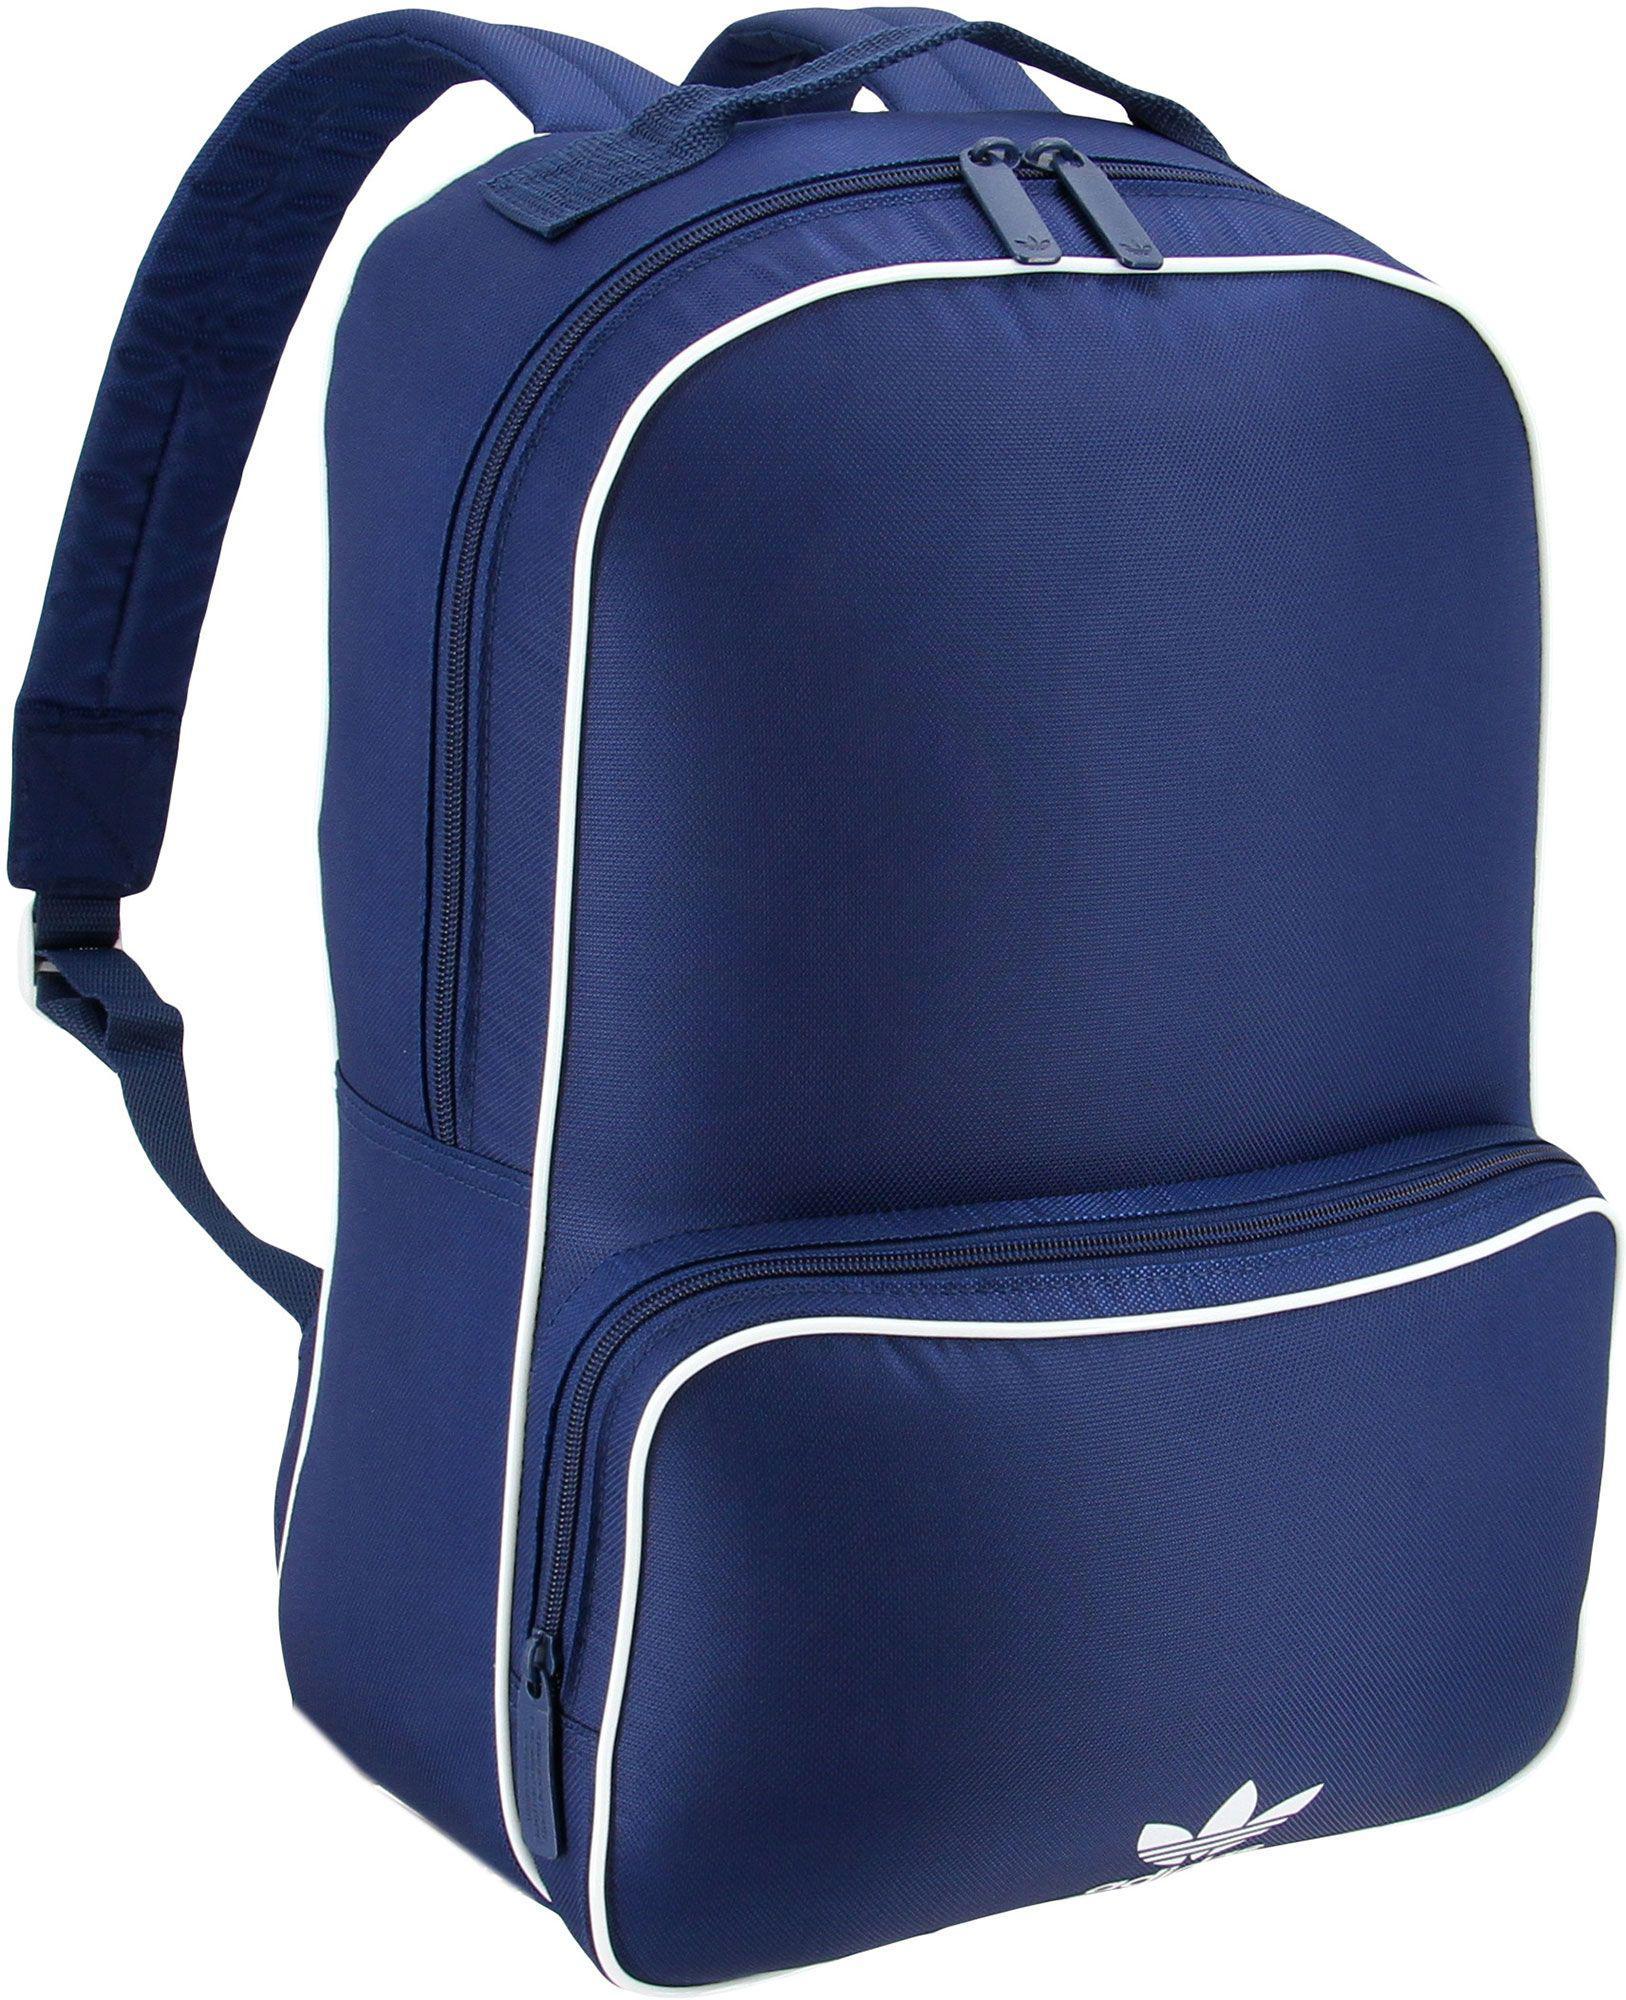 a6e7e361a43 Lyst - adidas Originals Santiago Backpack in Blue